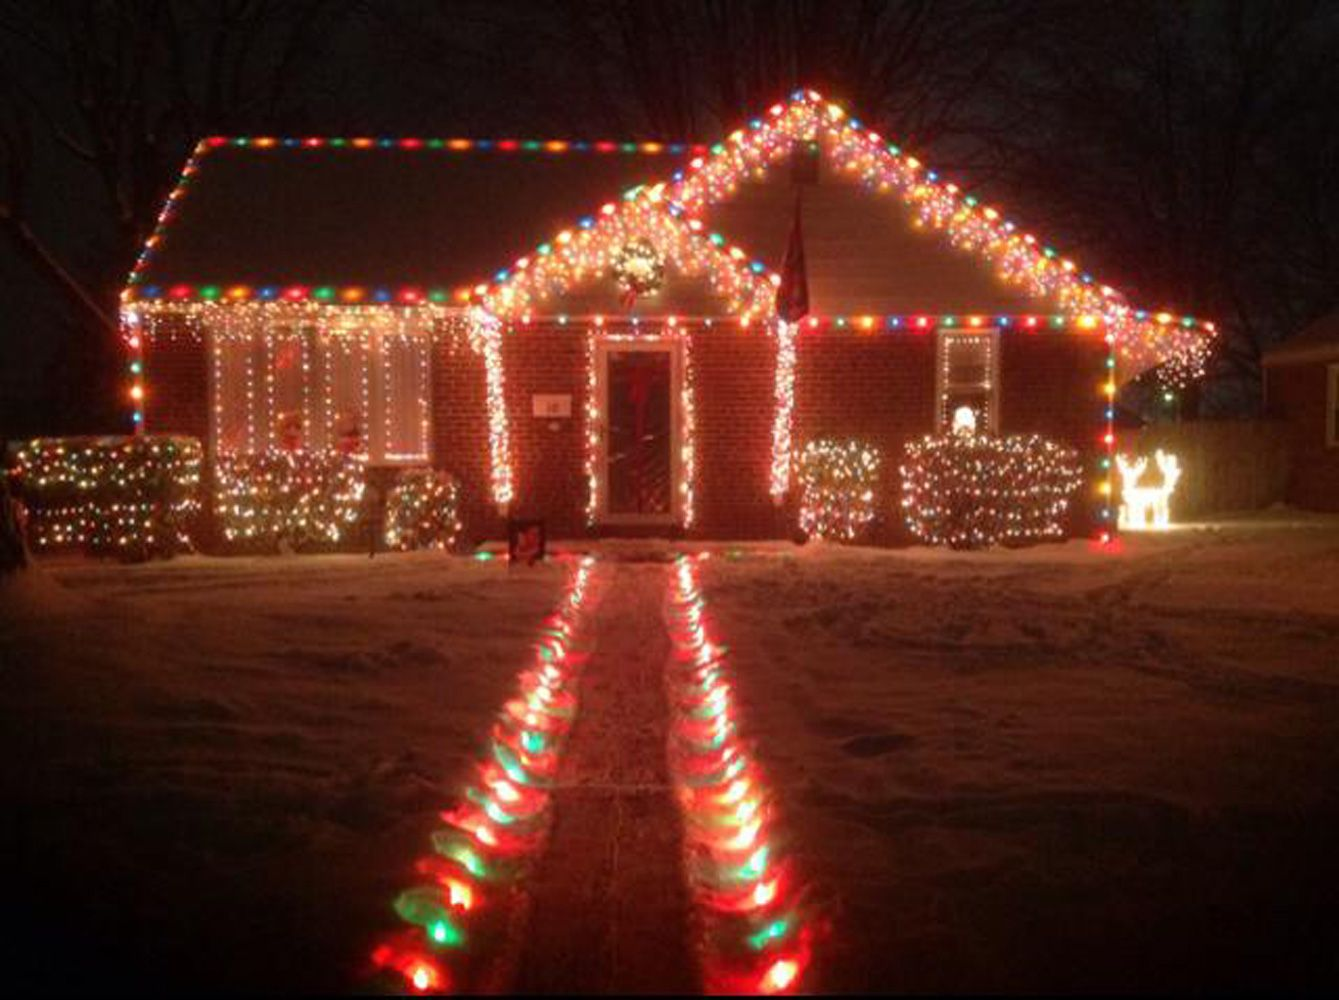 Gingerbread House Christmas Lights